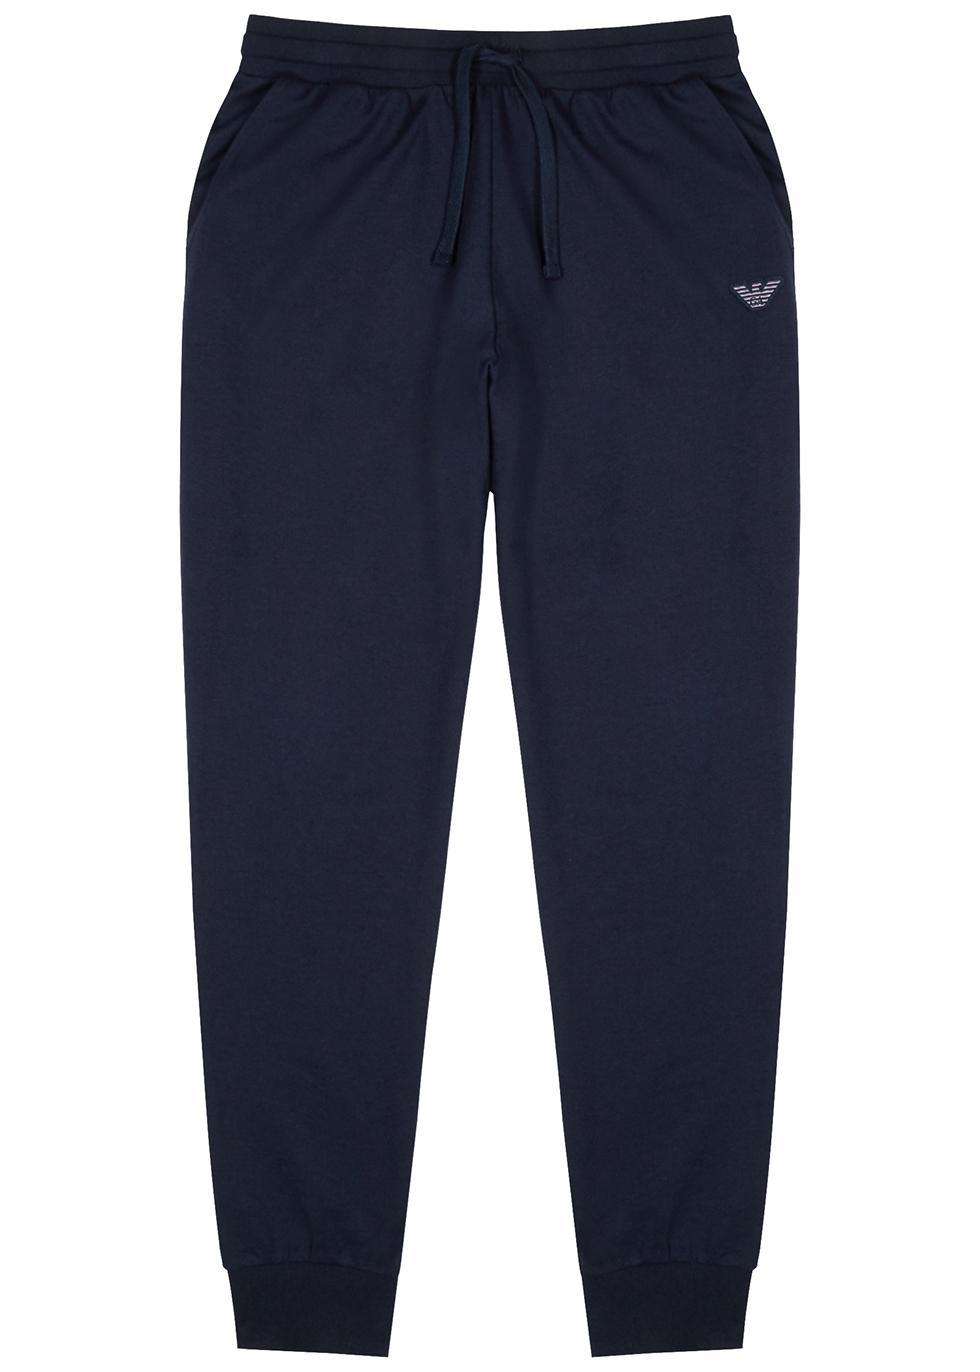 Navy jersey sweatpants